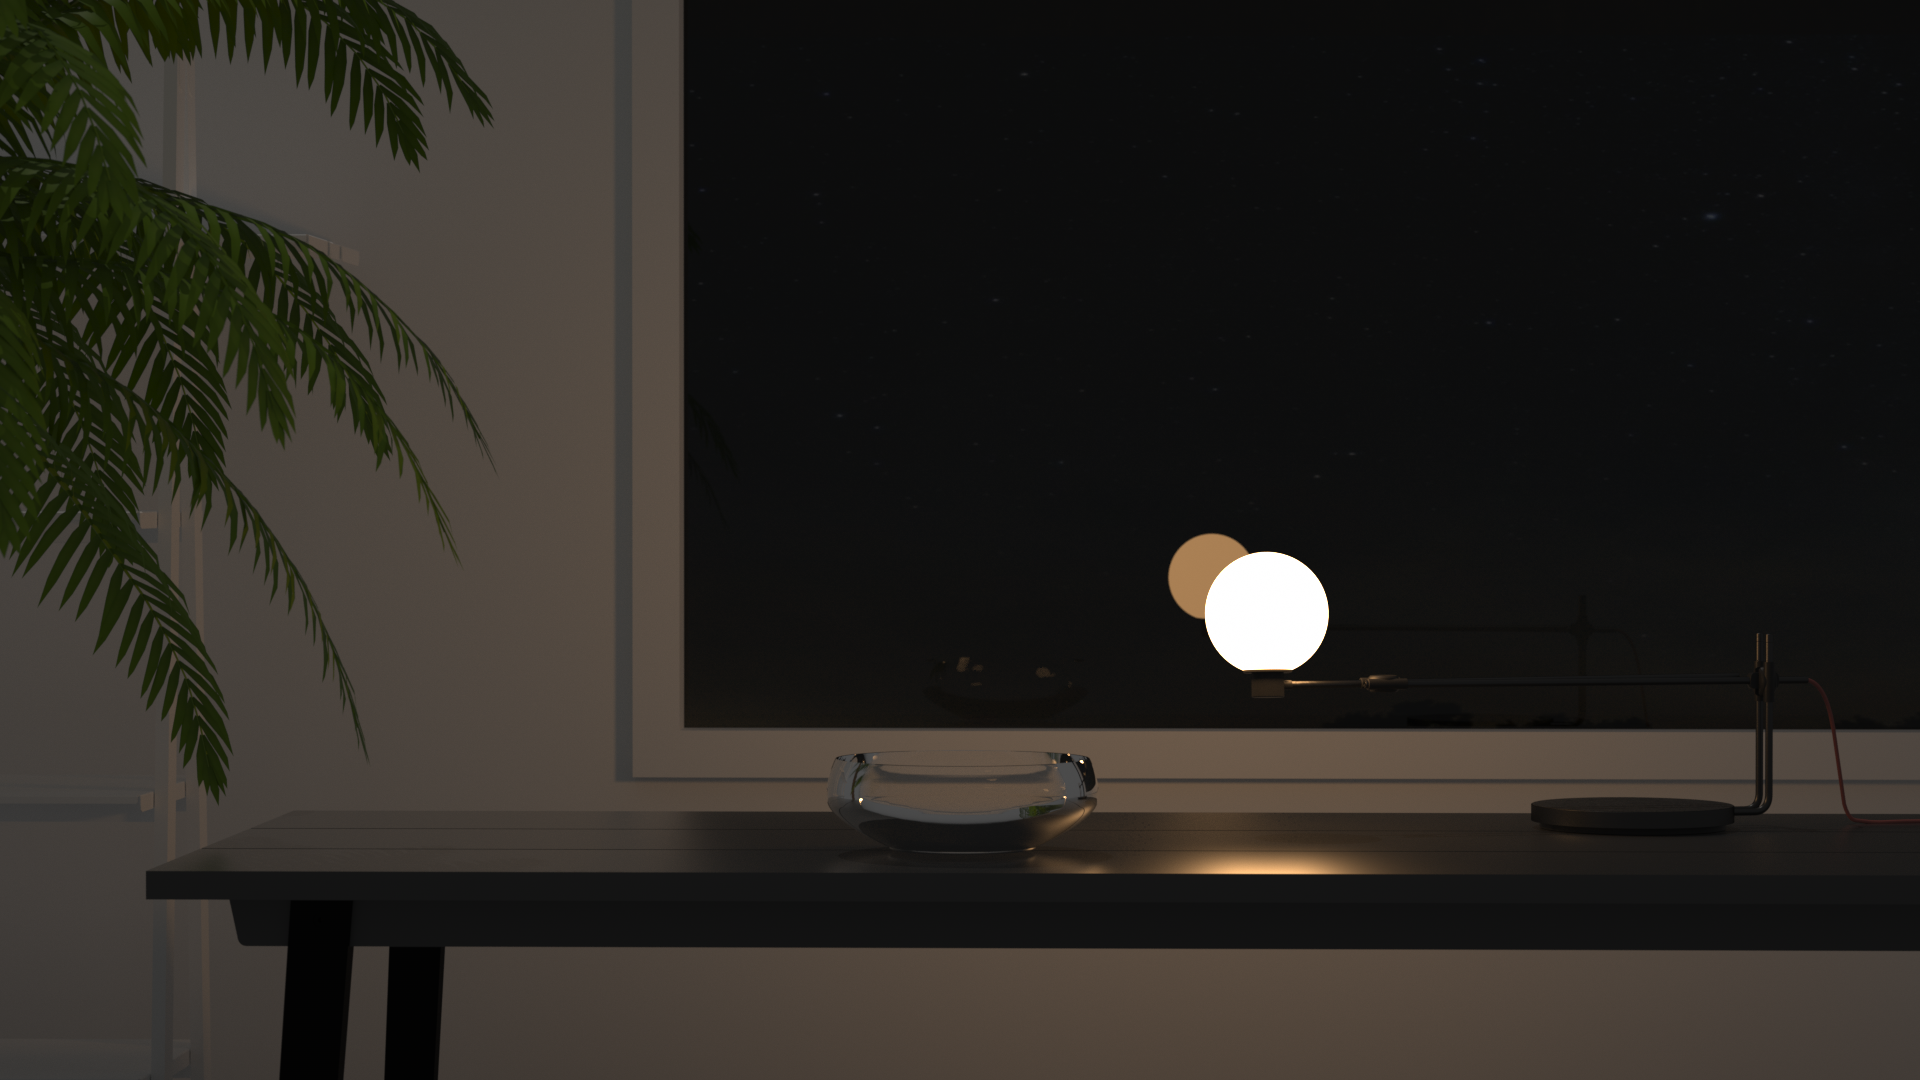 Dot_night1_0002